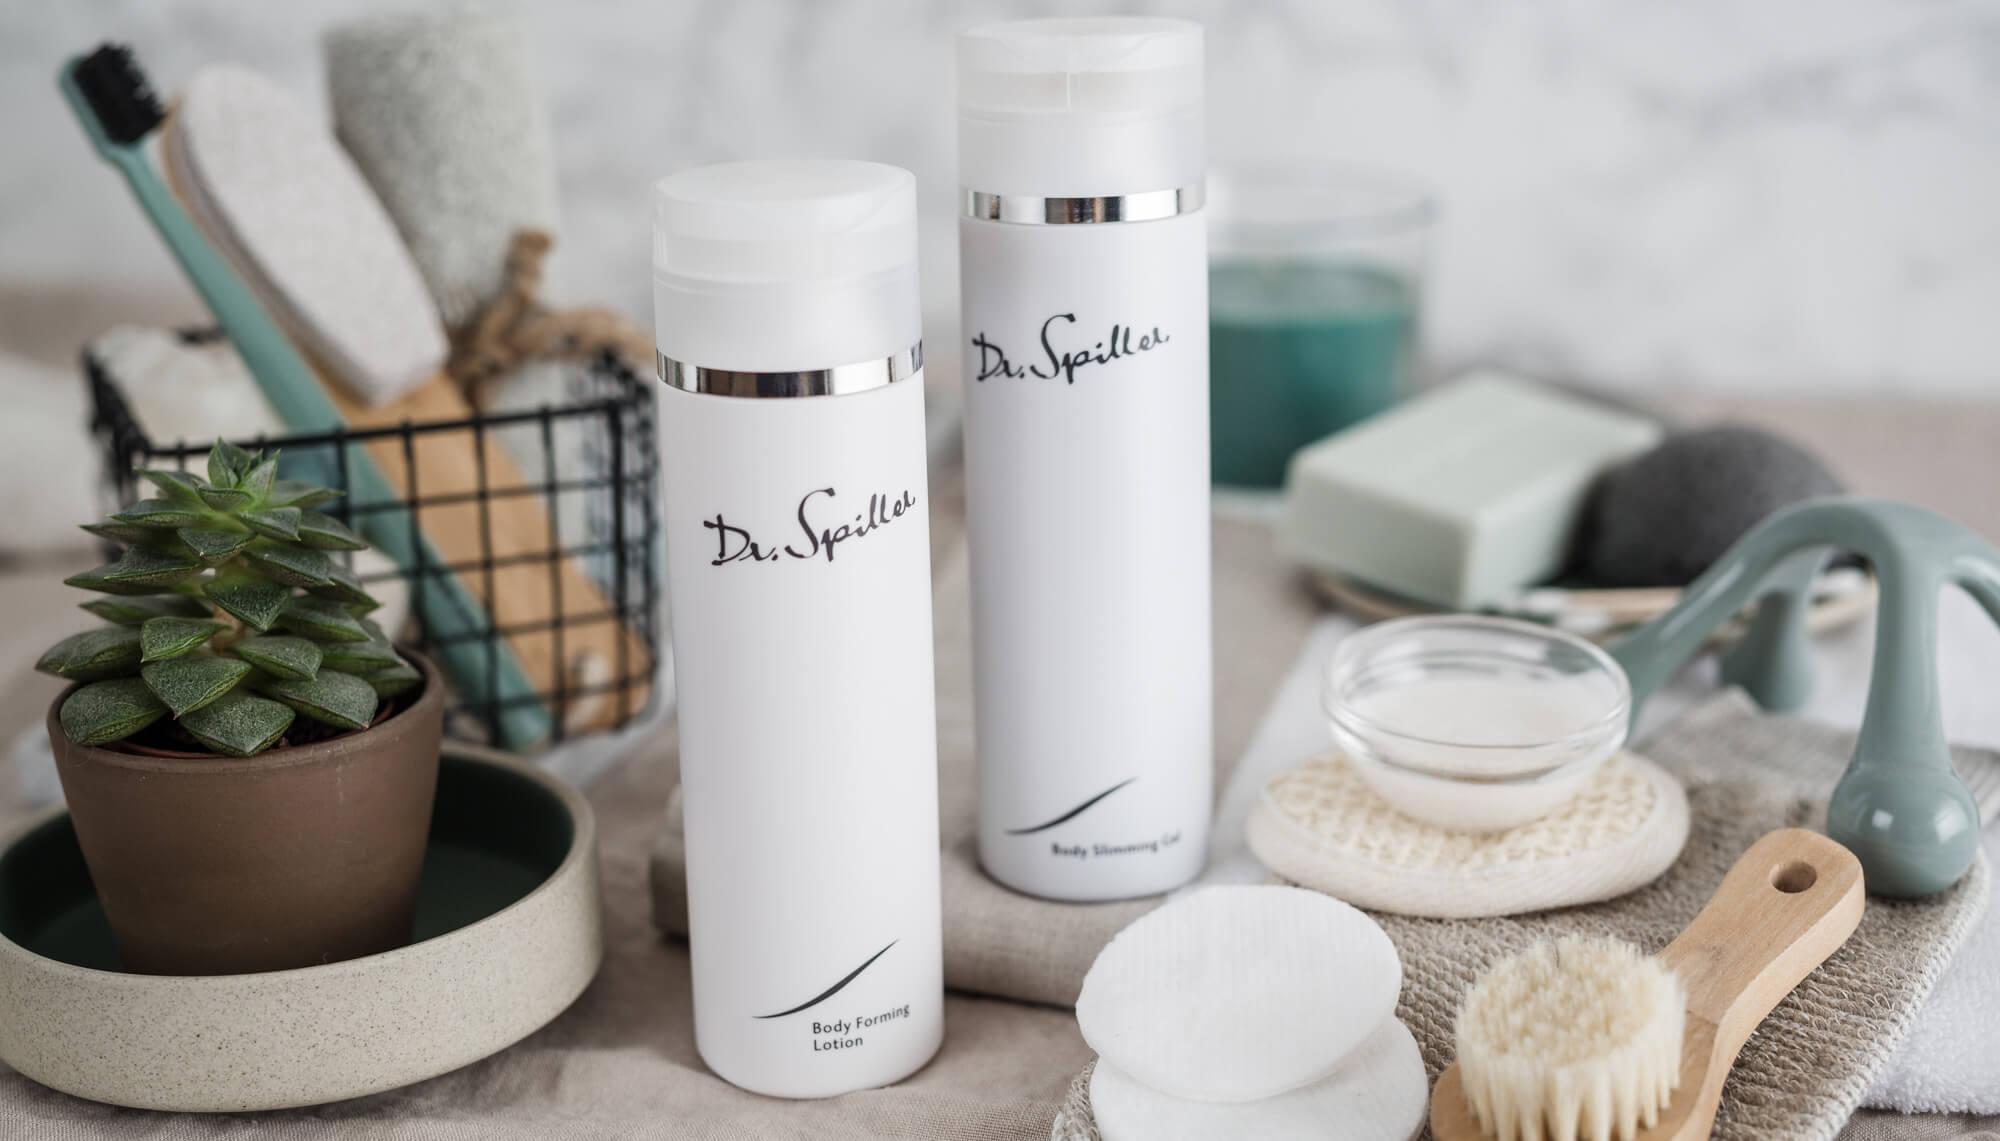 drspiller_news_cellulite_produkte perfect silhouette – körperpflege-set - drspiller news cellulite produkte - Perfect Silhouette – Körperpflege-Set